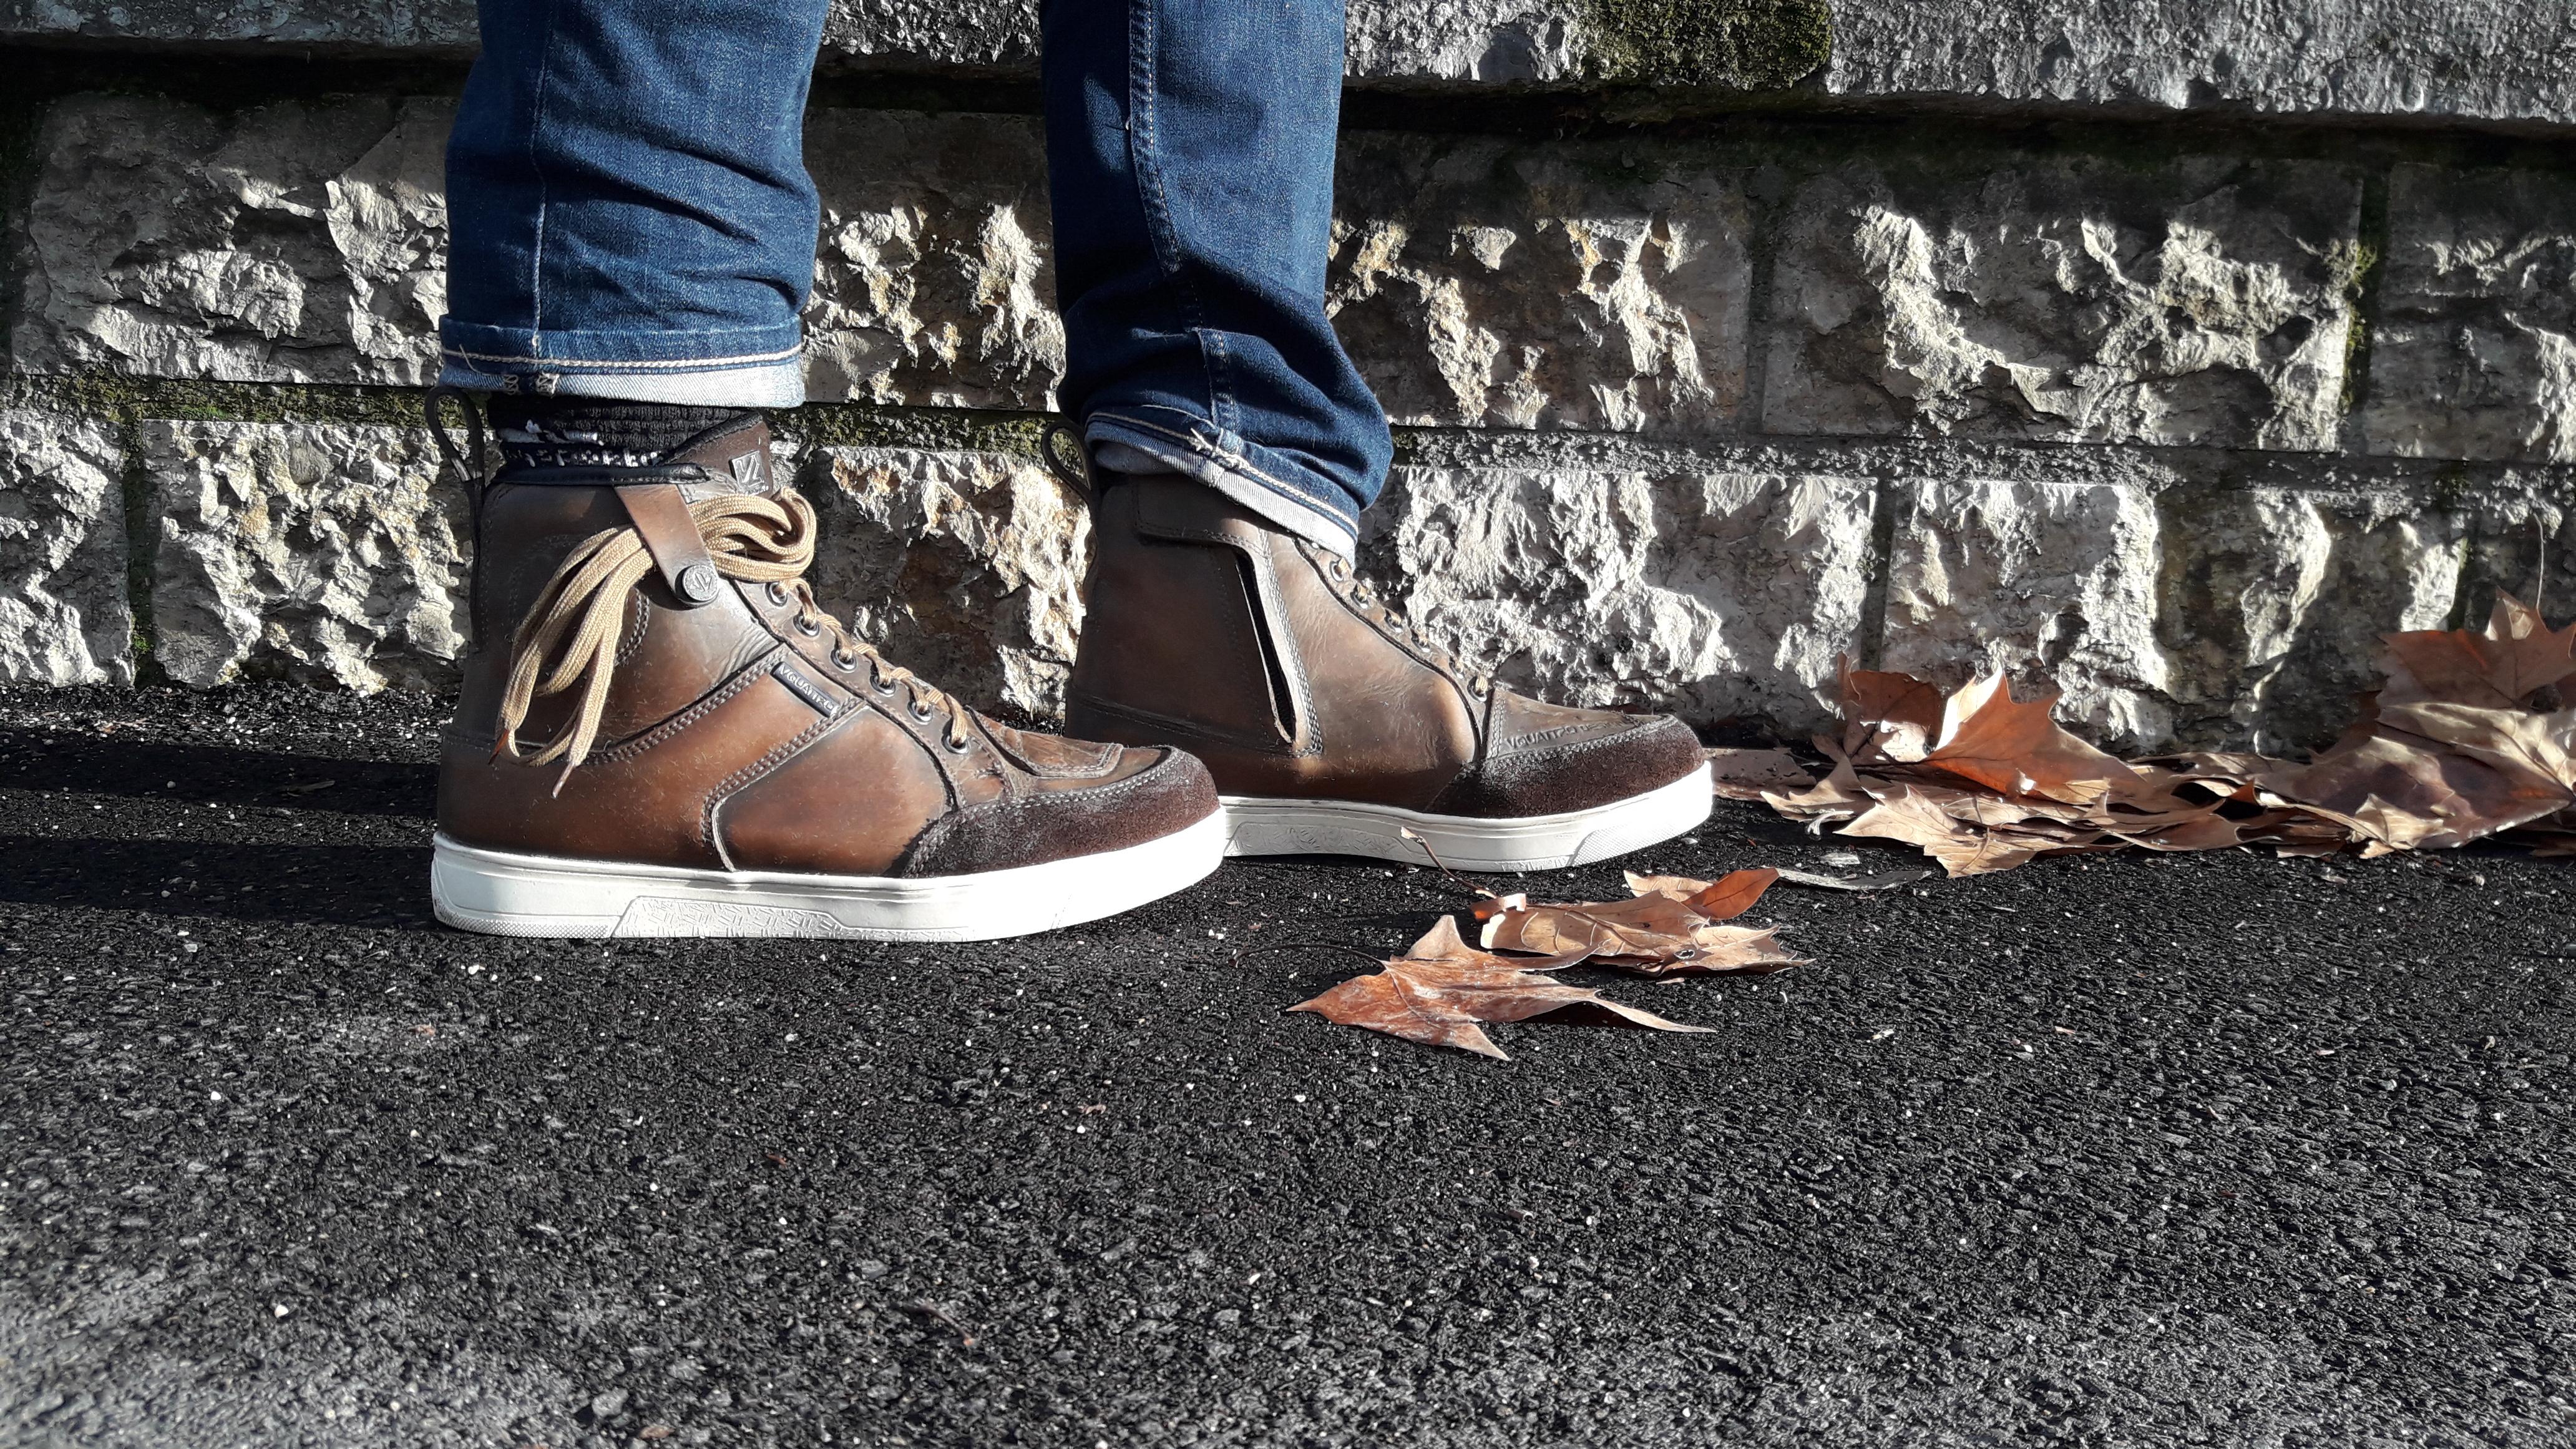 Chaussures V Quattro X-Urban : des chaussures urbaines